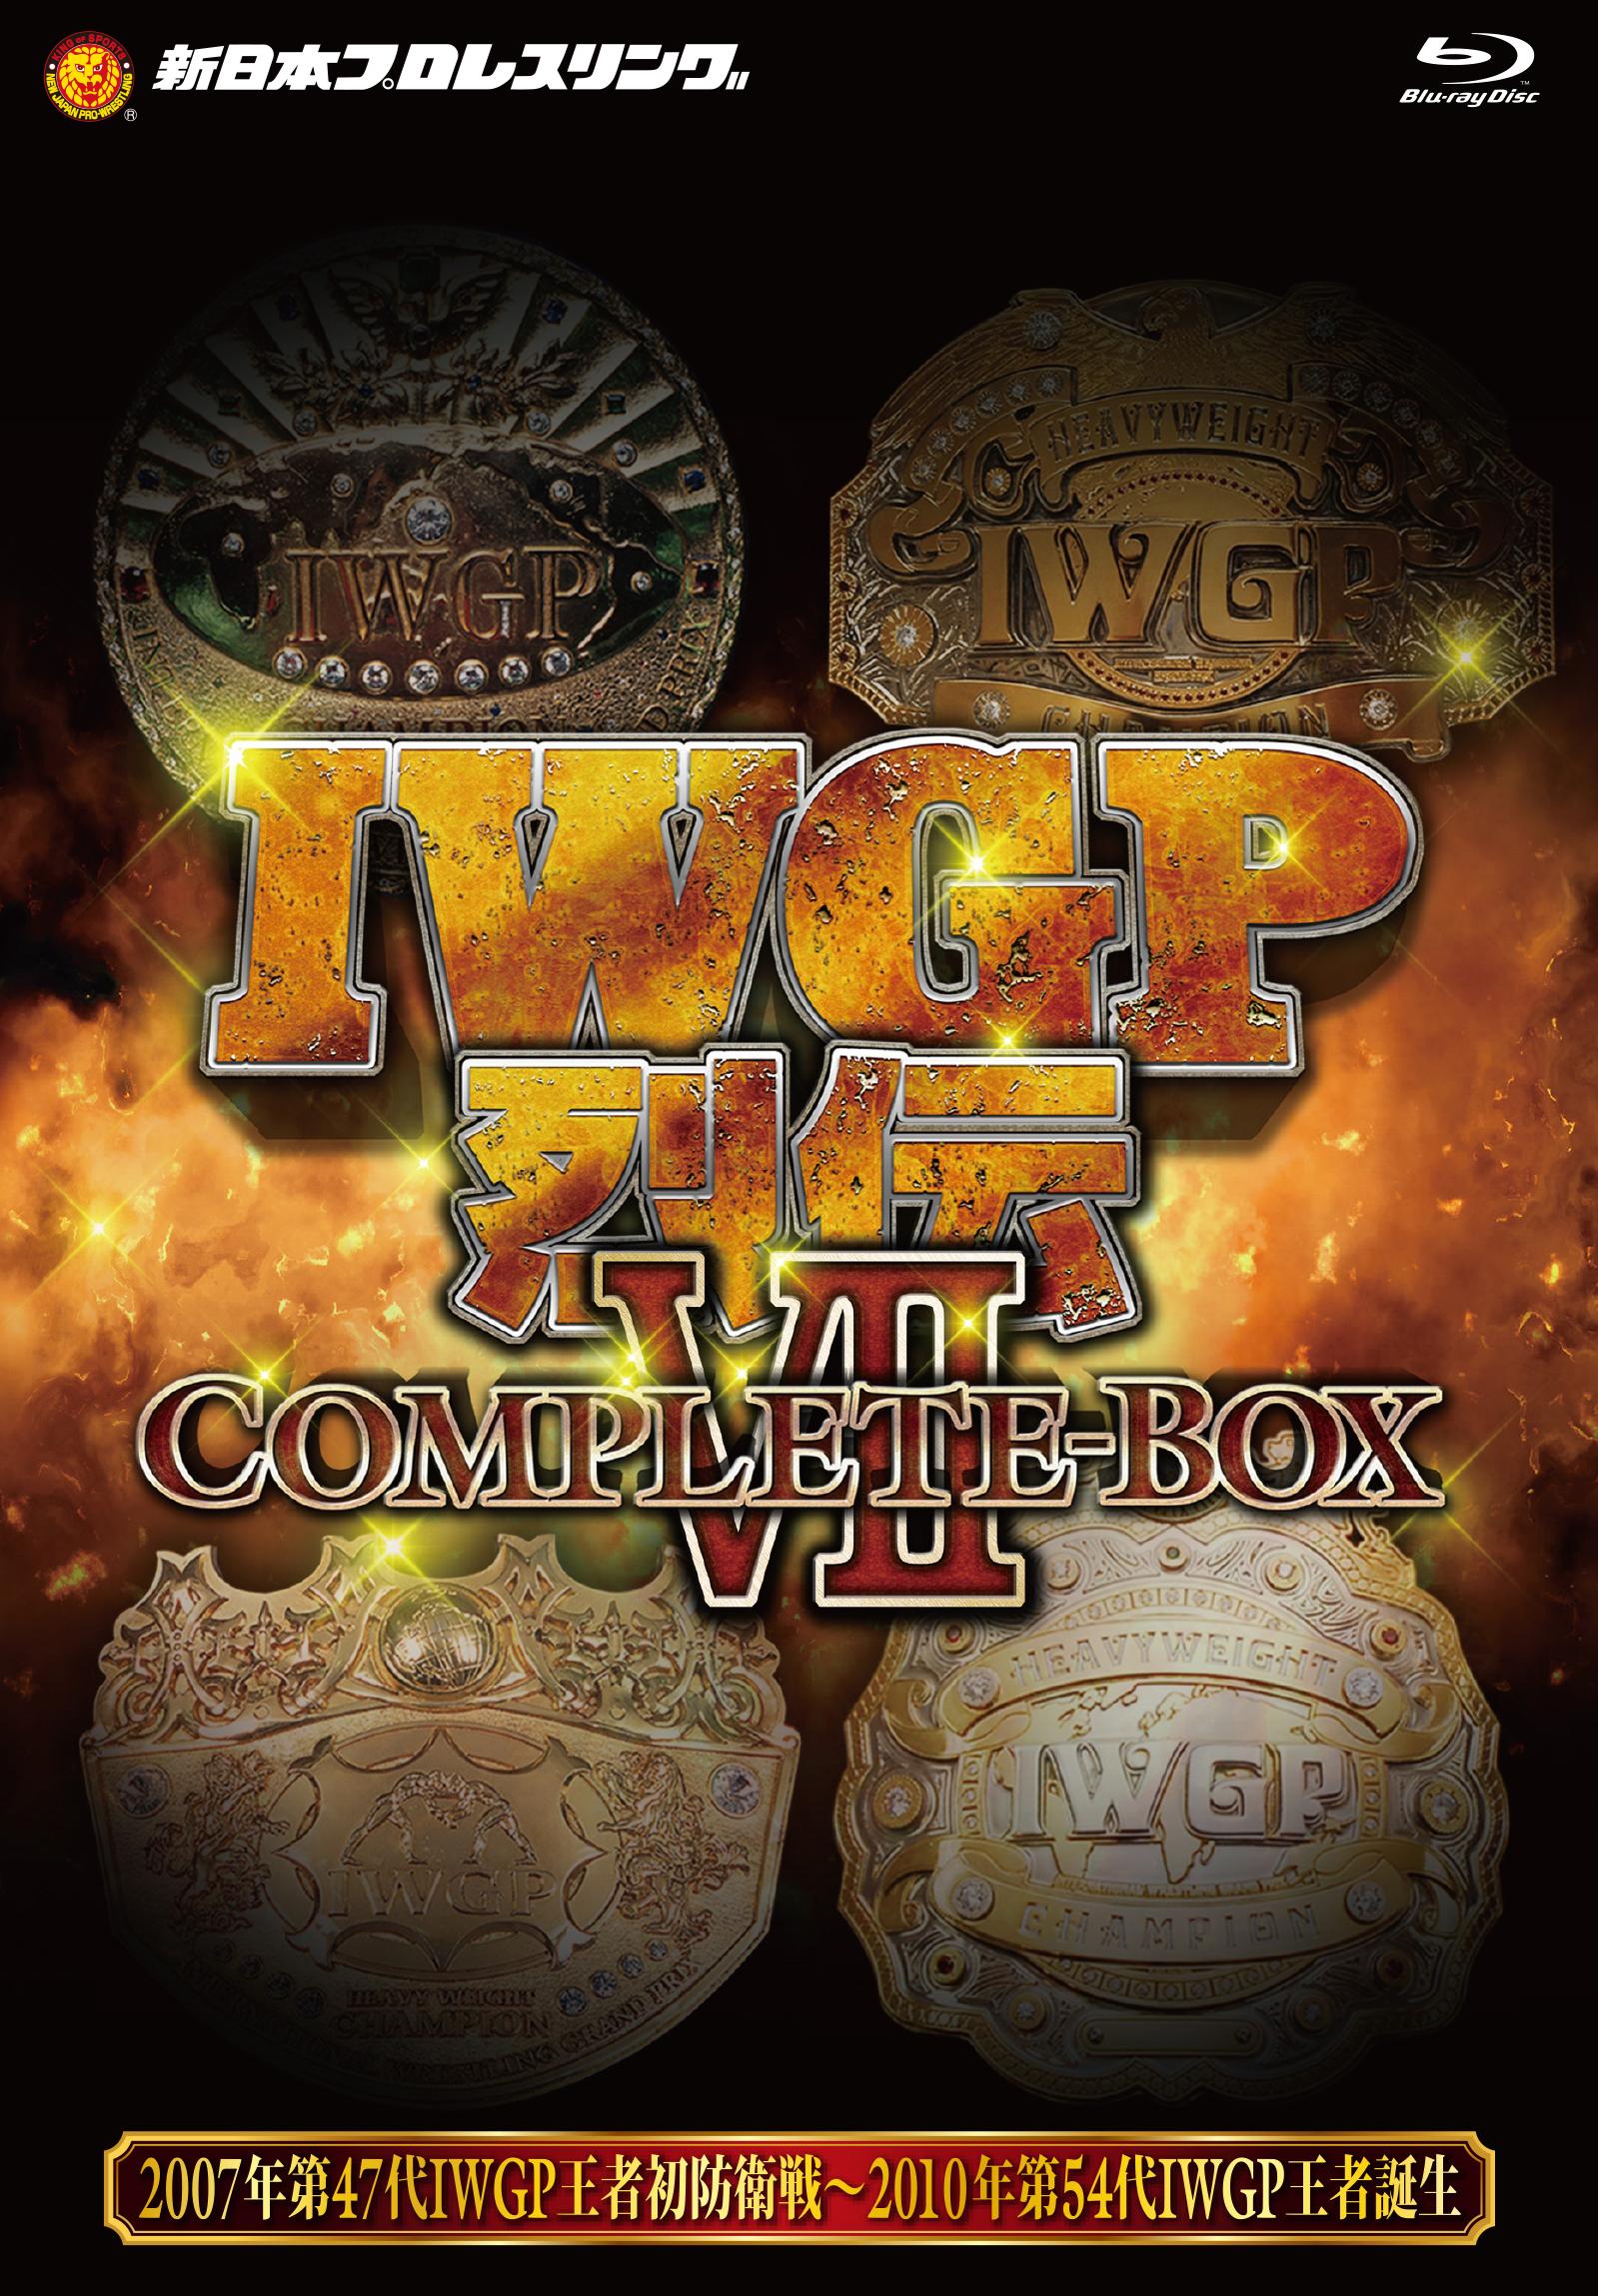 IWGP烈伝COMPLETE-BOX Ⅶ  2007年11月11日第47代IWGPヘビー級王者棚橋弘至初防衛戦~2010年5月3日第54代IWGPヘビー級王者真壁刀義誕生までを収録。【Blu-ray-BOX】